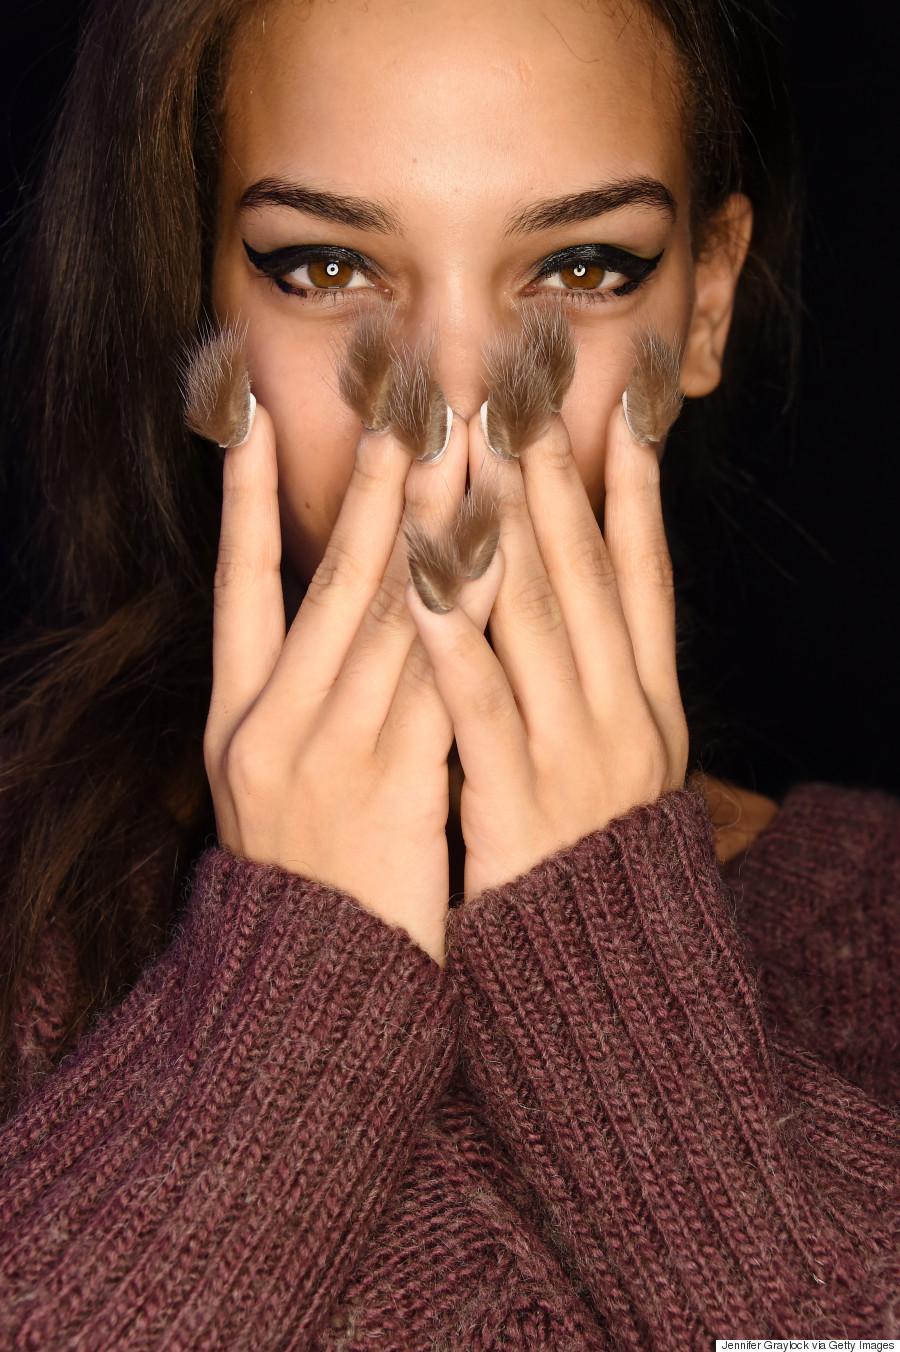 Libertine Models Don Fur Nails On The NYFW Fall 2016 Runway